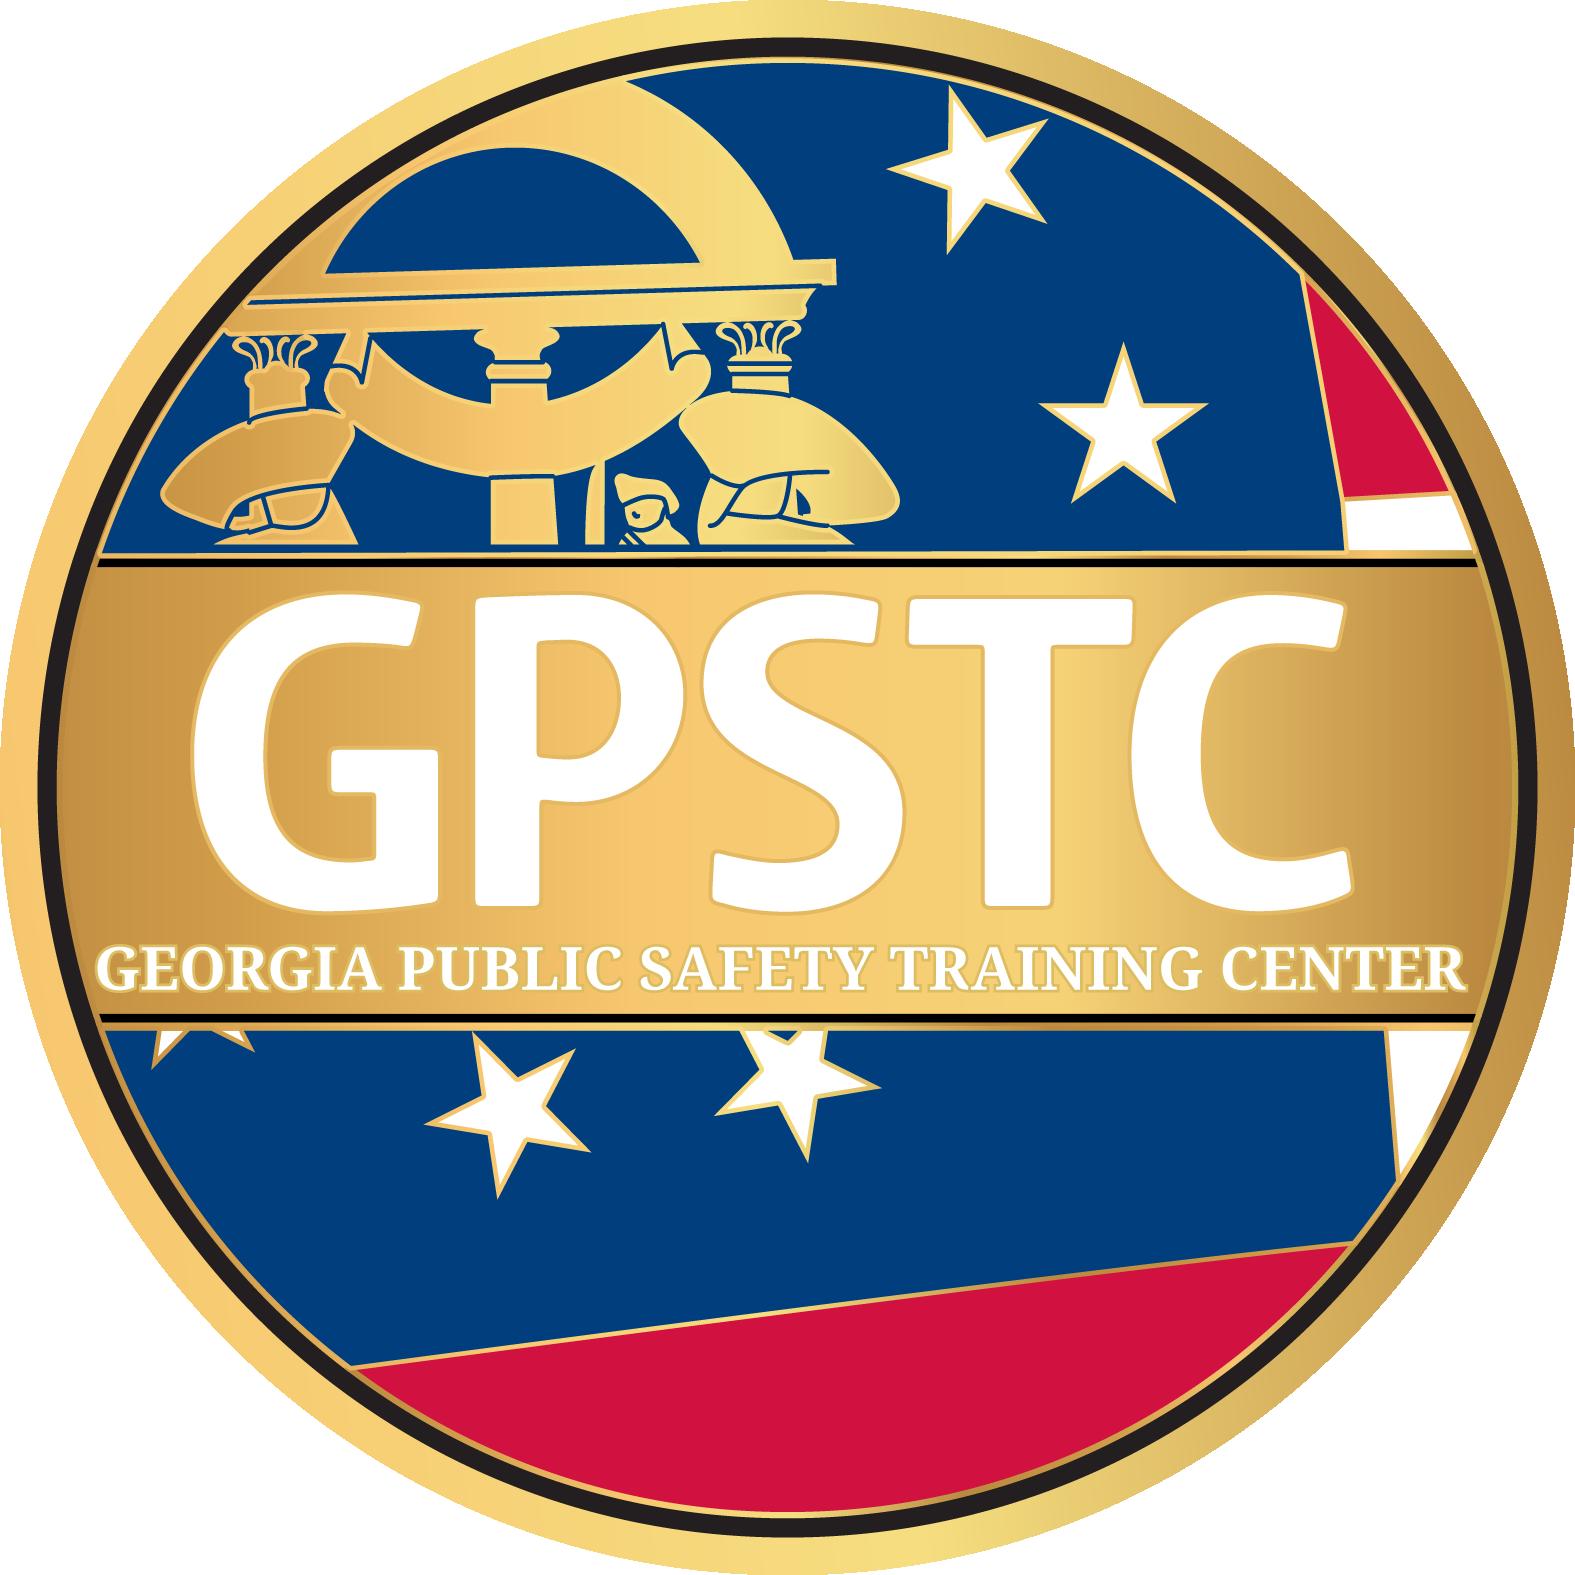 Home - GPSTC